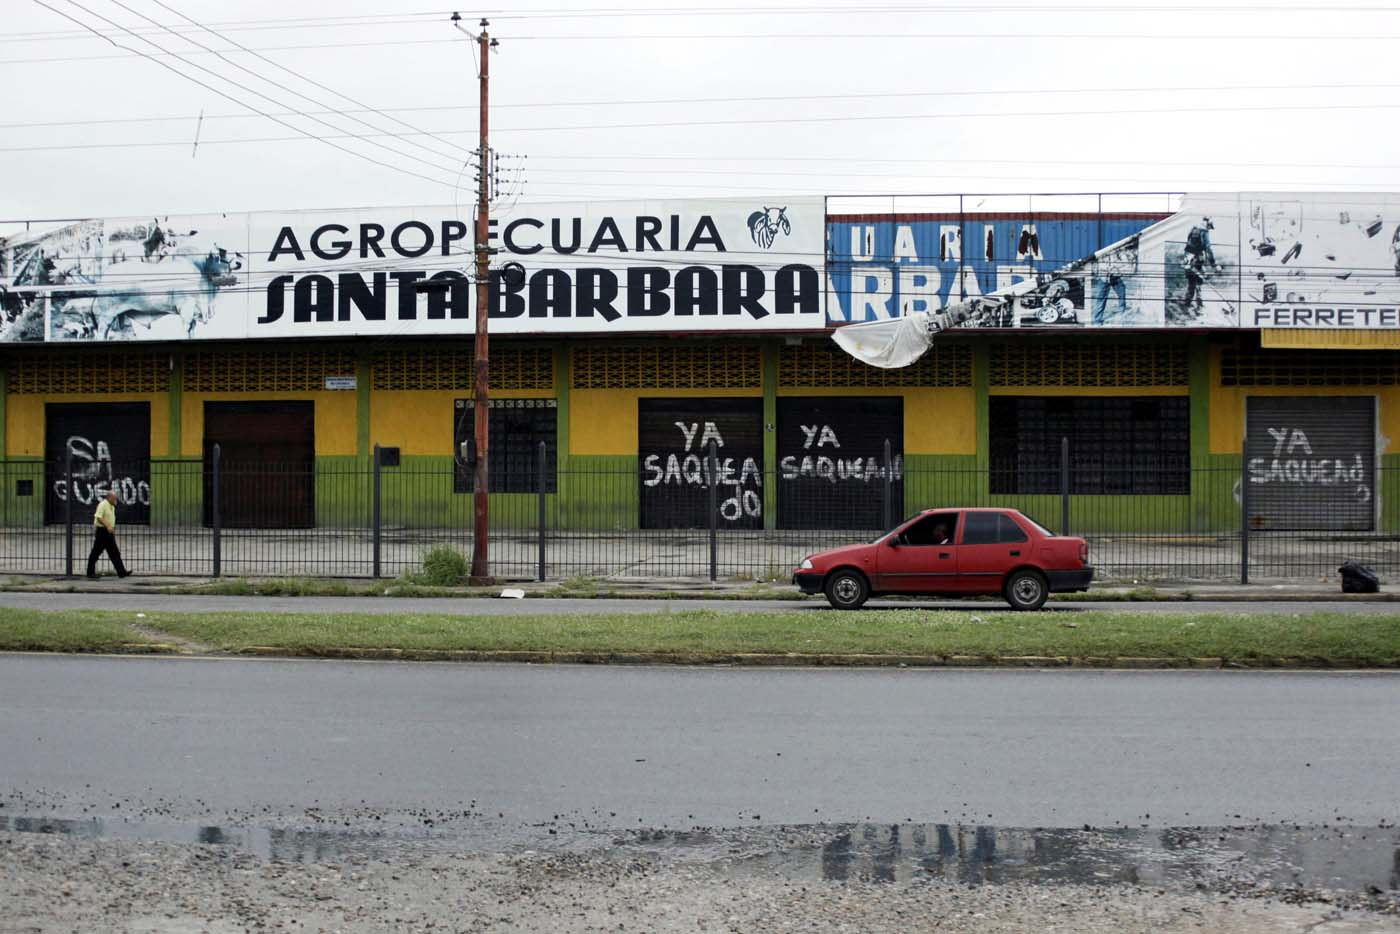 "A man walks past the gates of shops that read, ""Already looted"" in Barinas, Venezuela June 12, 2017. Picture taken June 12, 2017. REUTERS/Carlos Eduardo Ramirez"